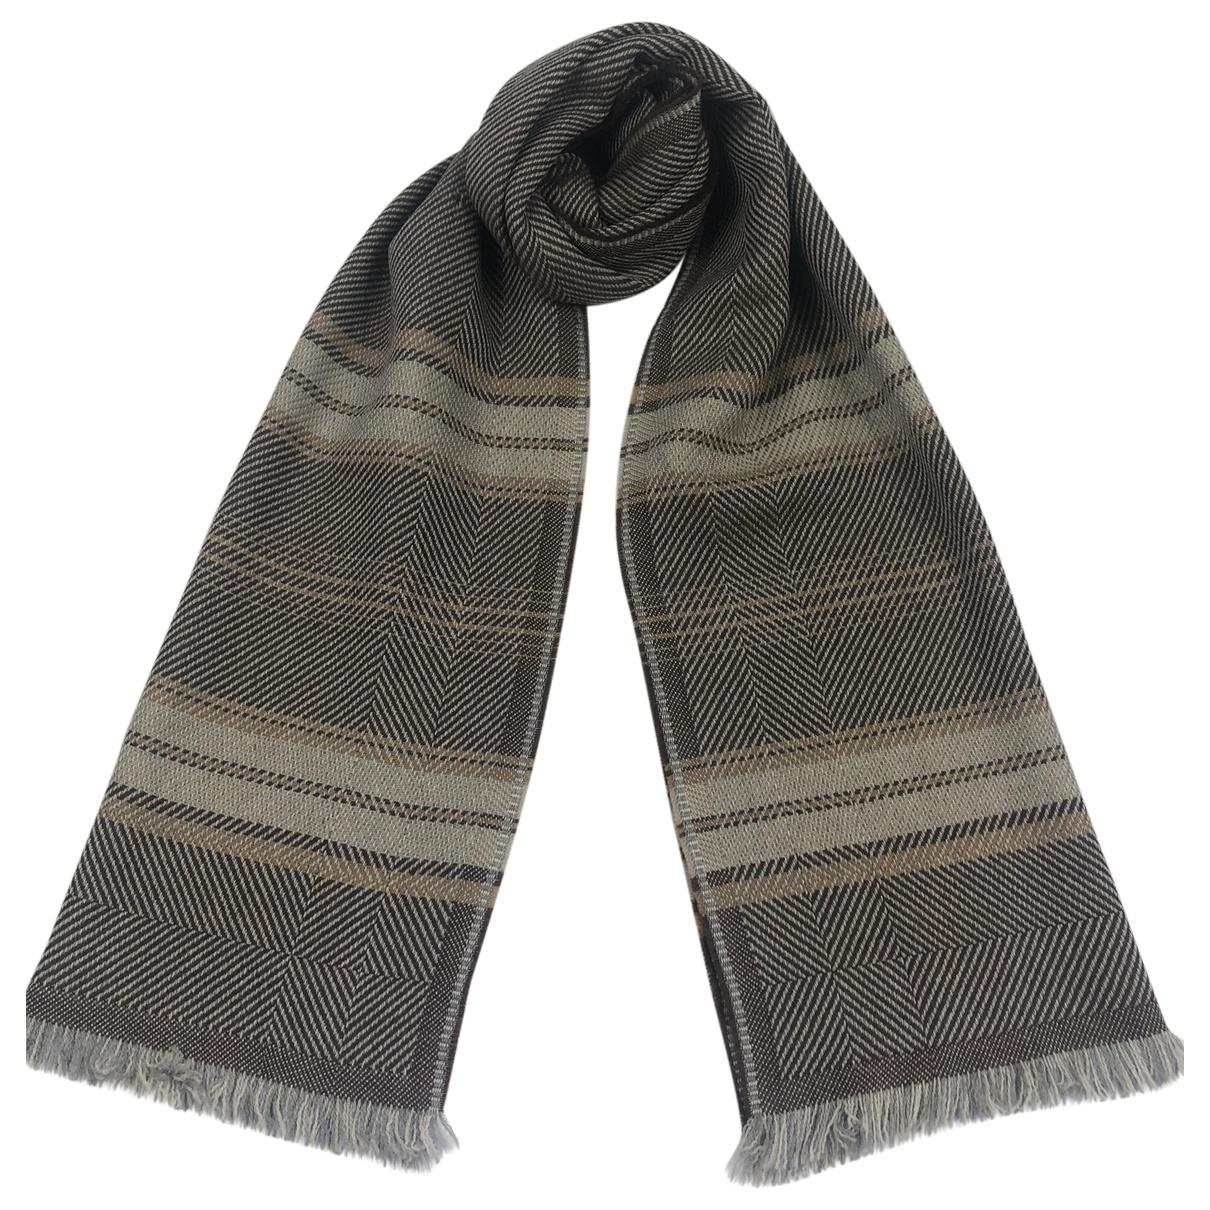 Lanvin \N Brown Wool scarf & pocket squares for Men \N